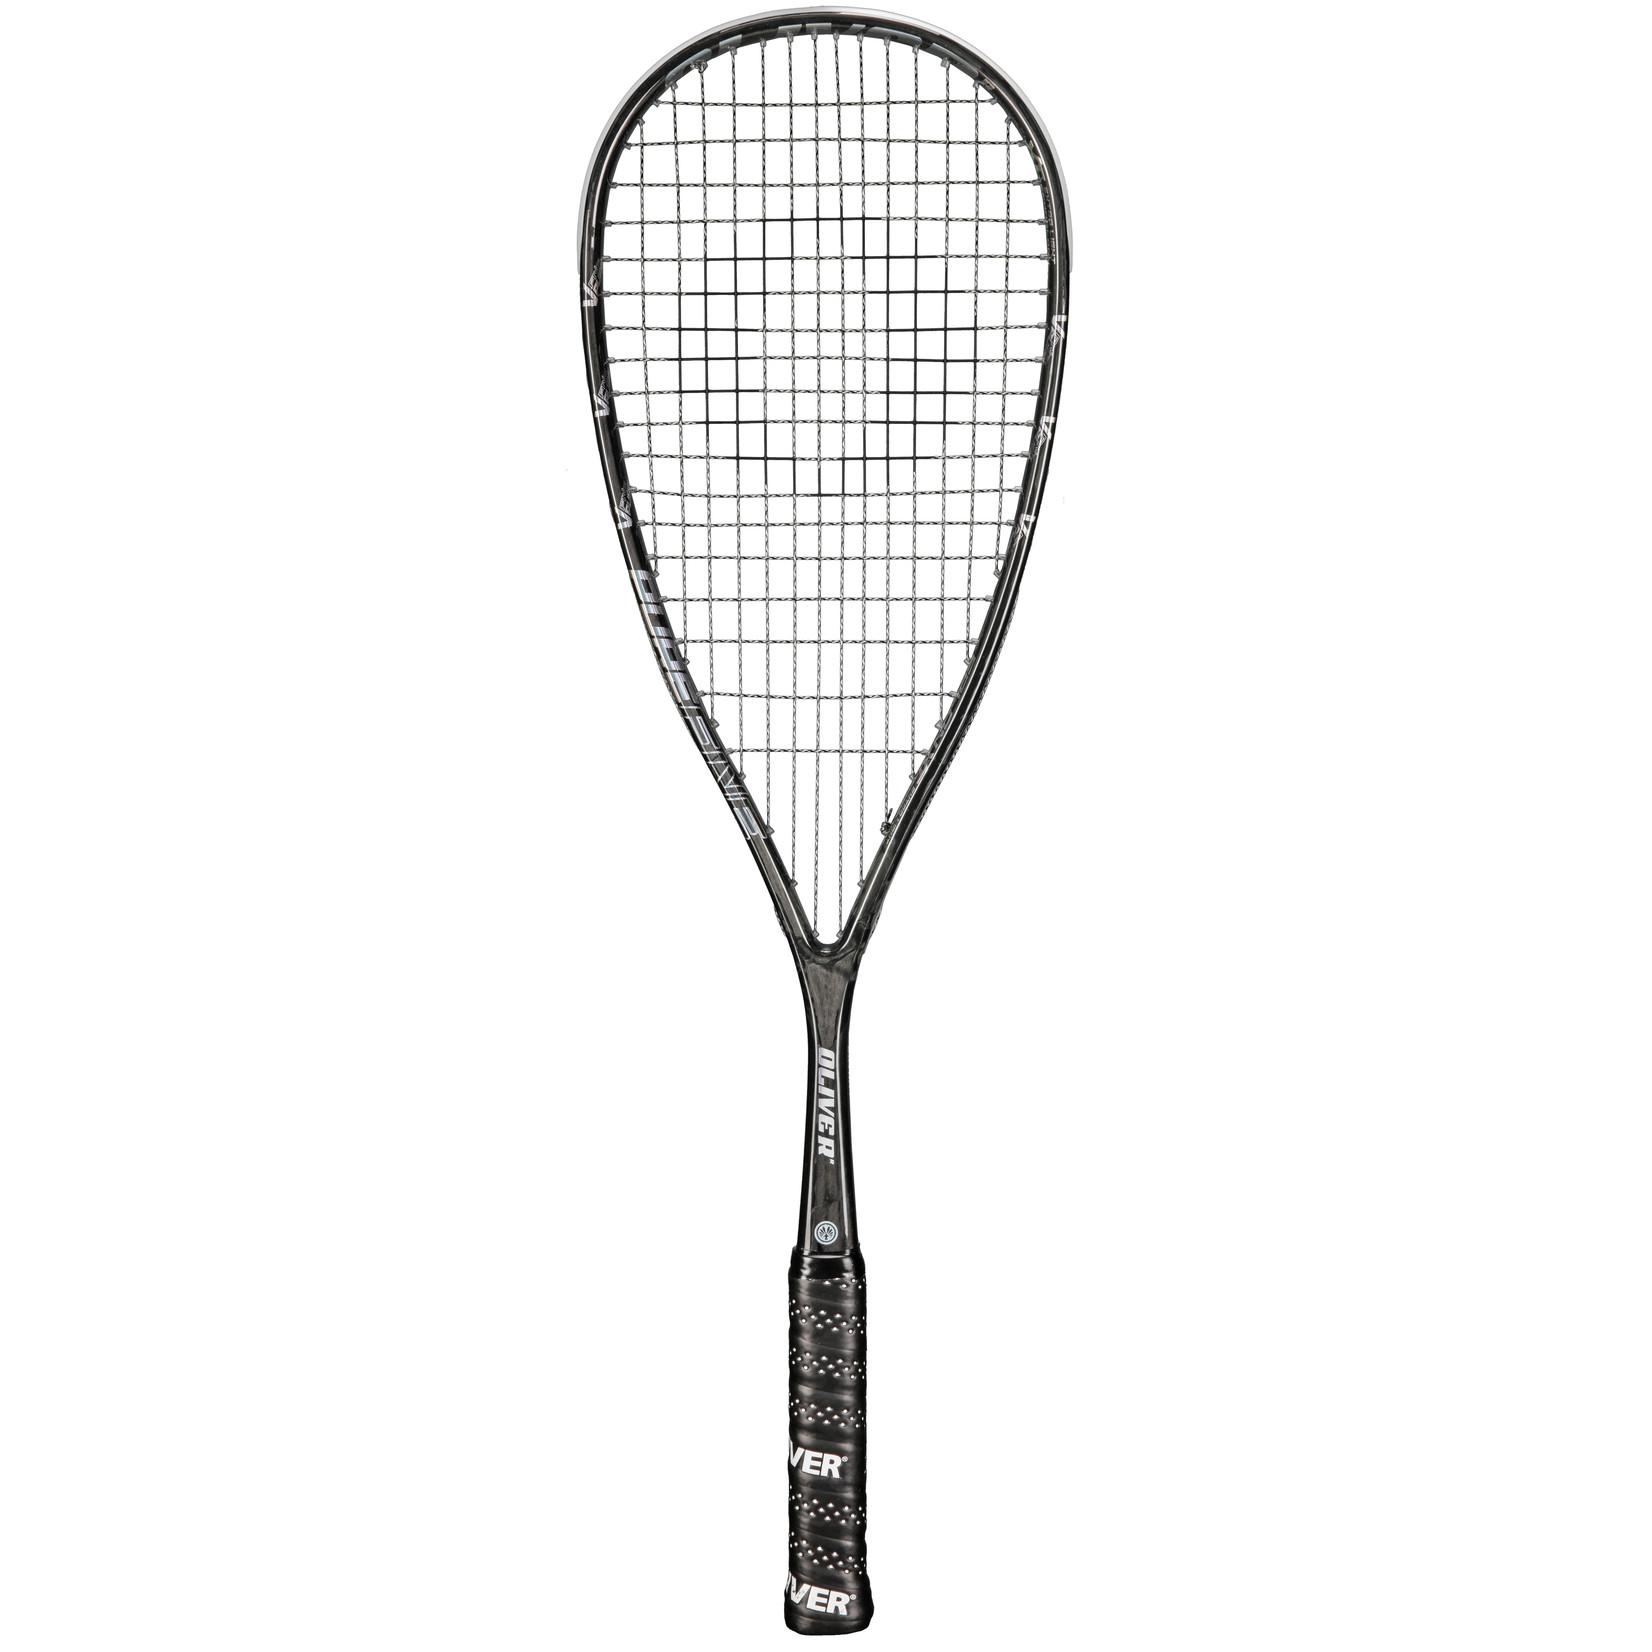 Oliver Pure 5 squashracket